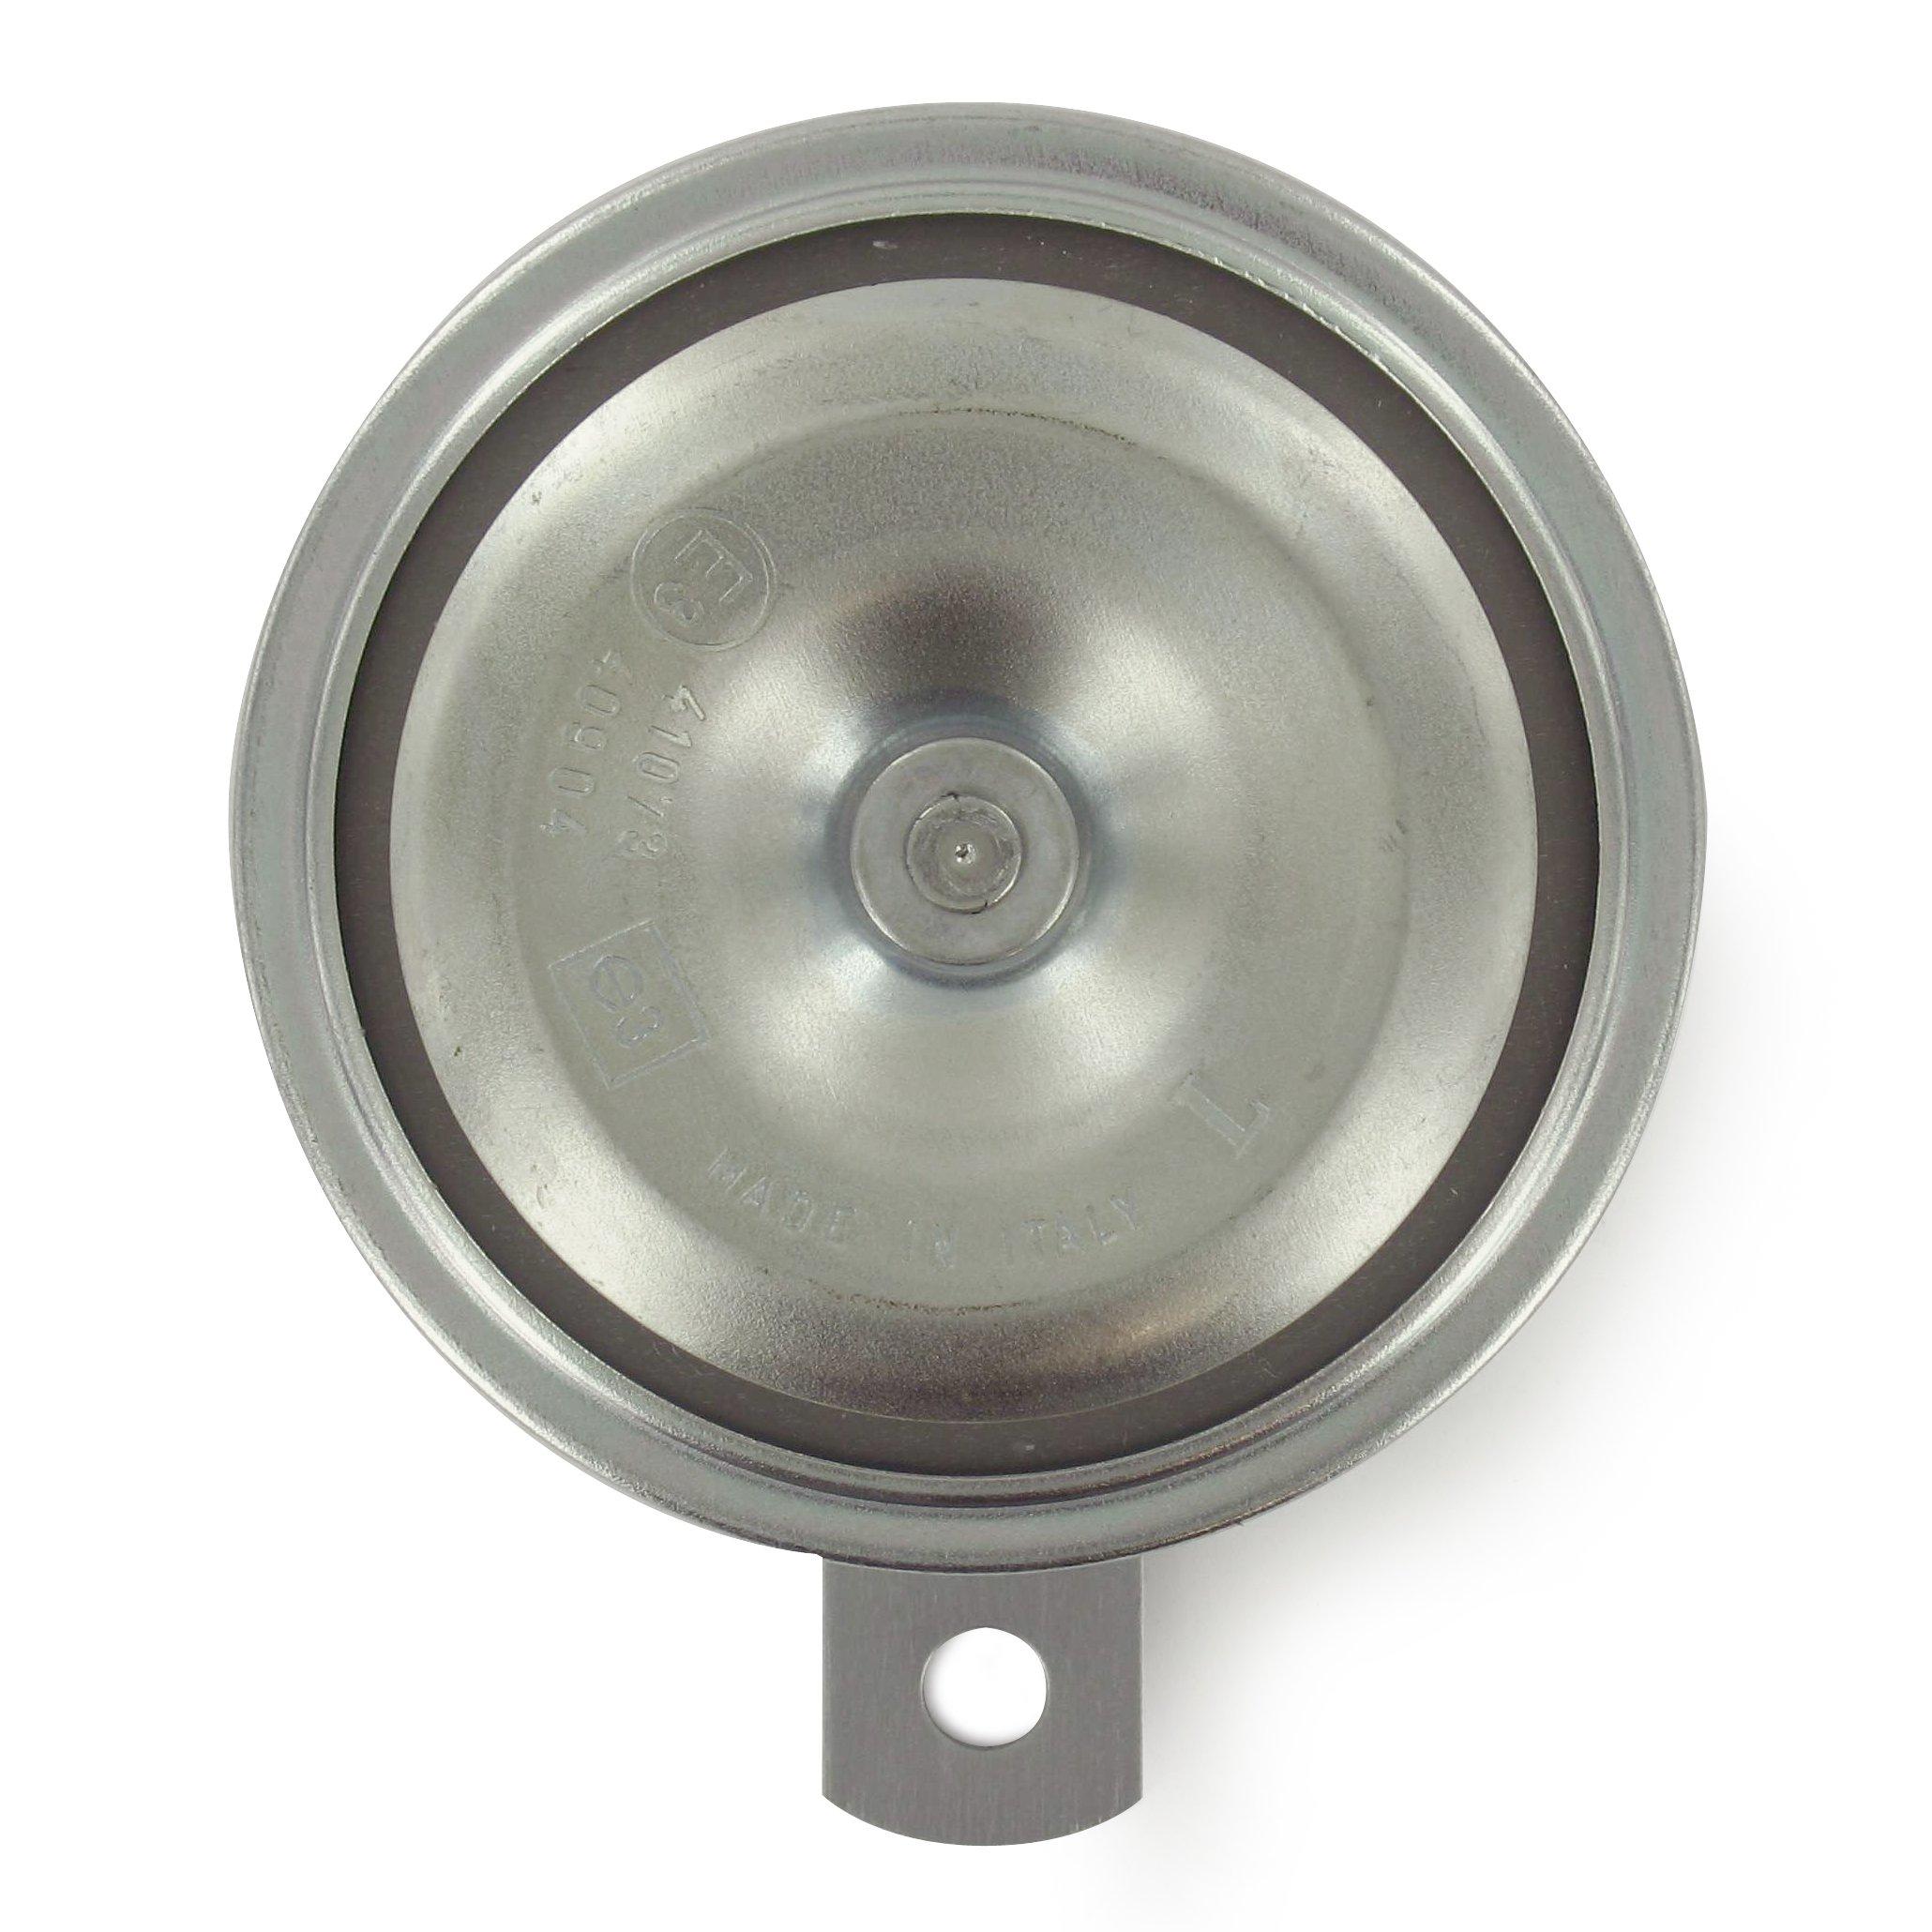 Intella 04081030 Forklift Horn, 36-48V, 112 Decibel Output, 90 mm Diameter, Low Tone